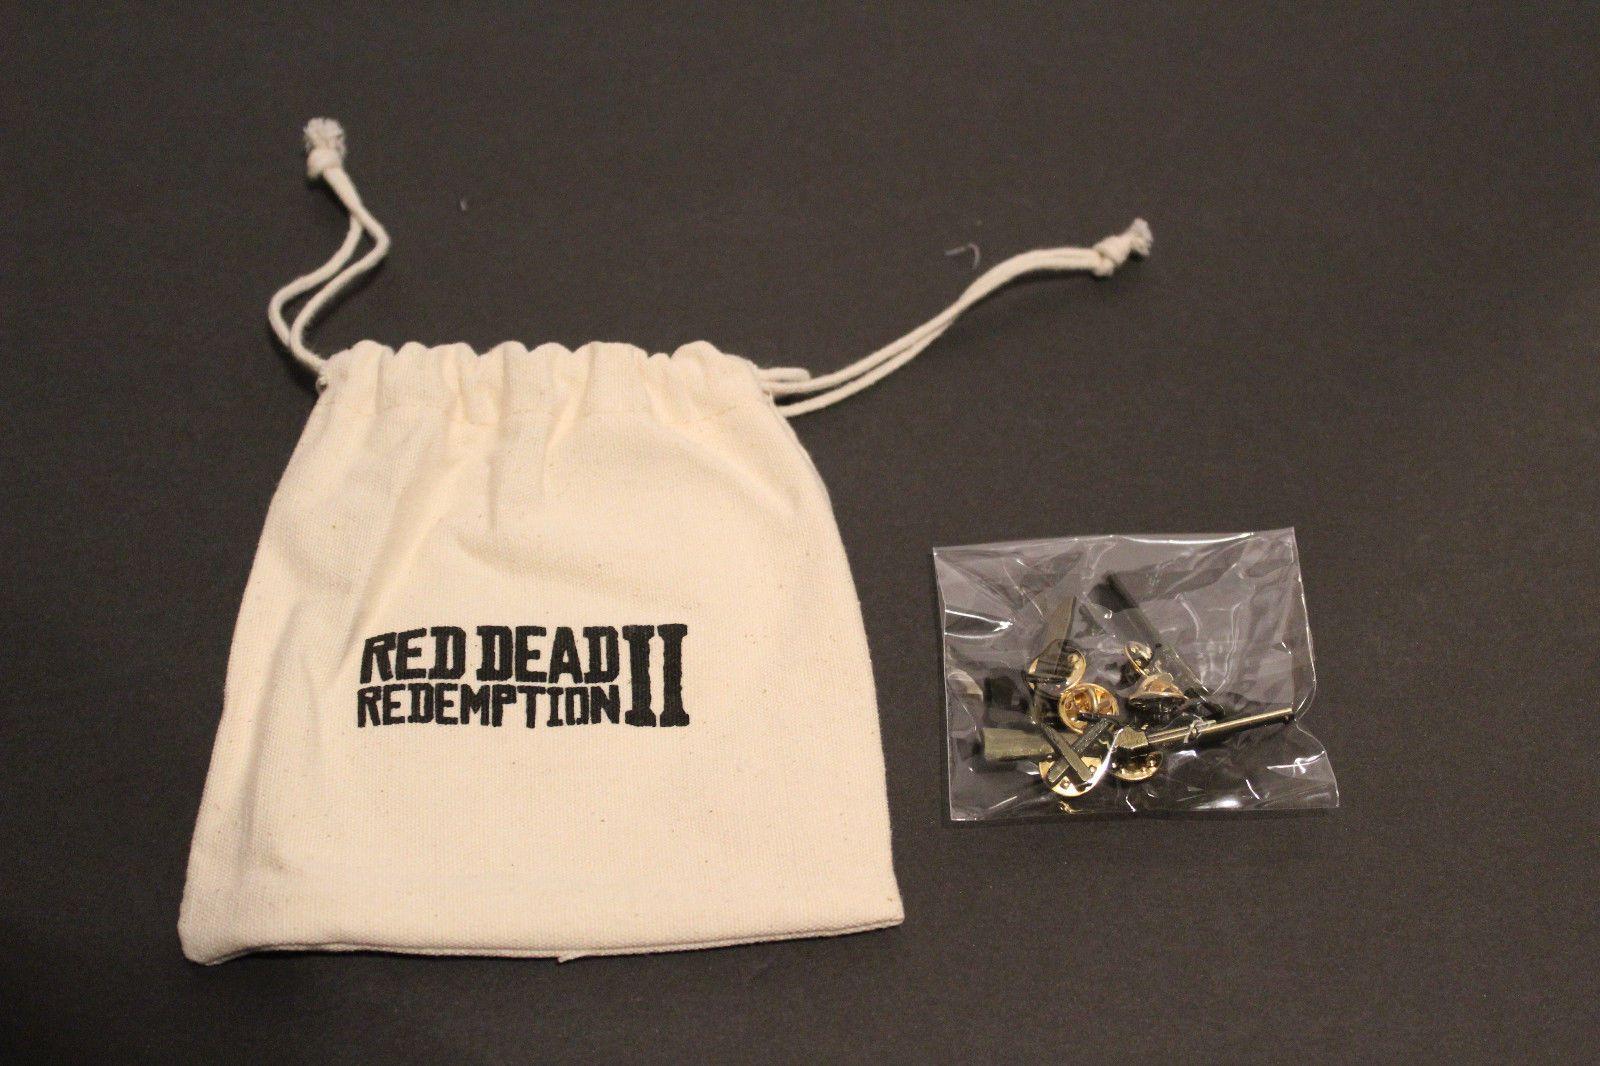 Details About Red Dead Redemption 2 Collectors Edition Canvas Bag